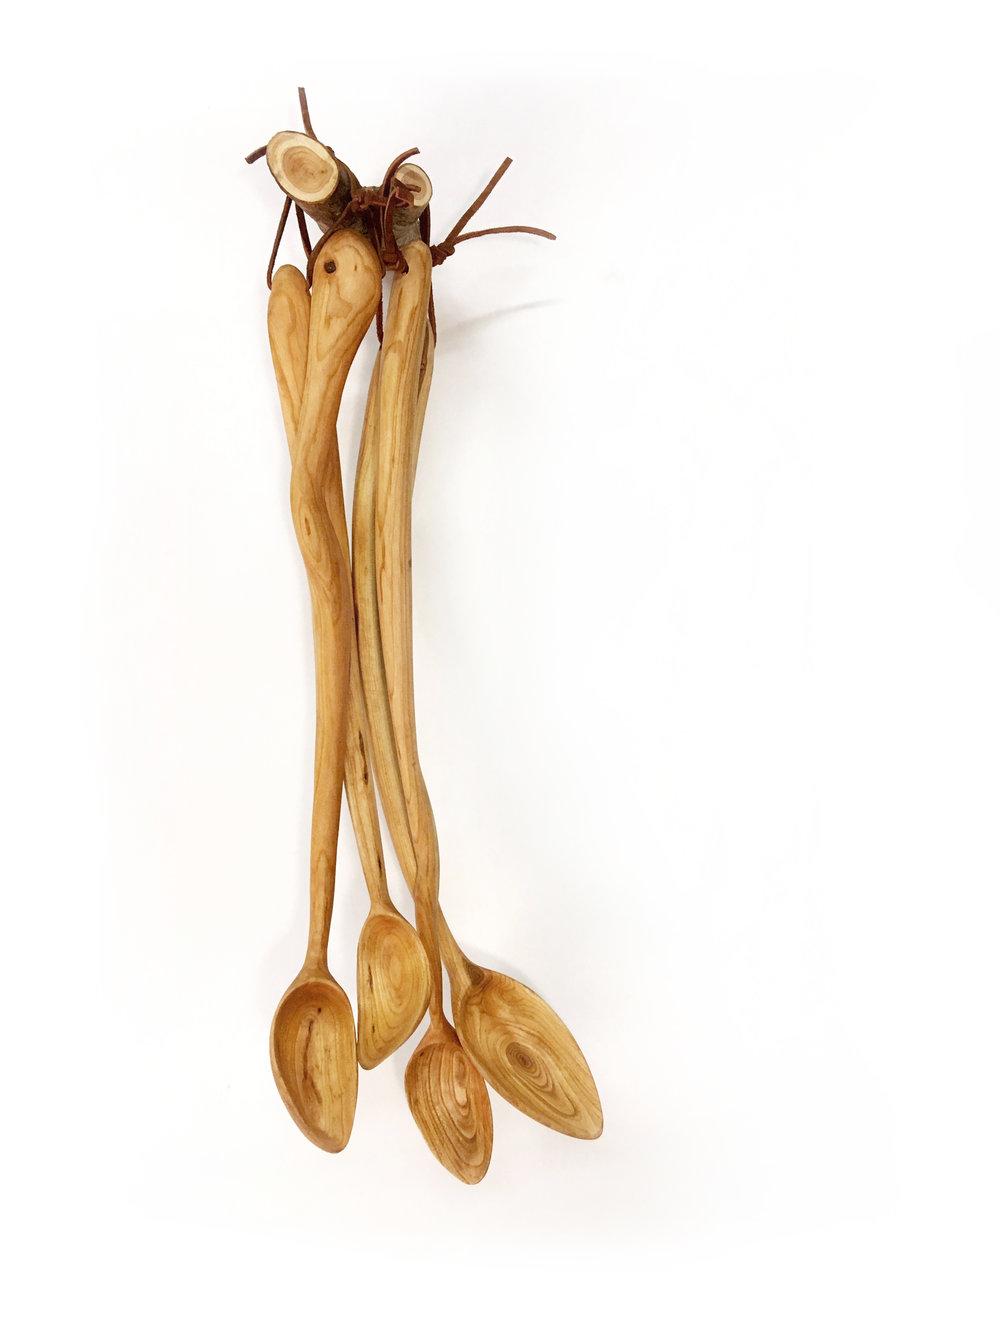 Tenant's Harbor Spoons